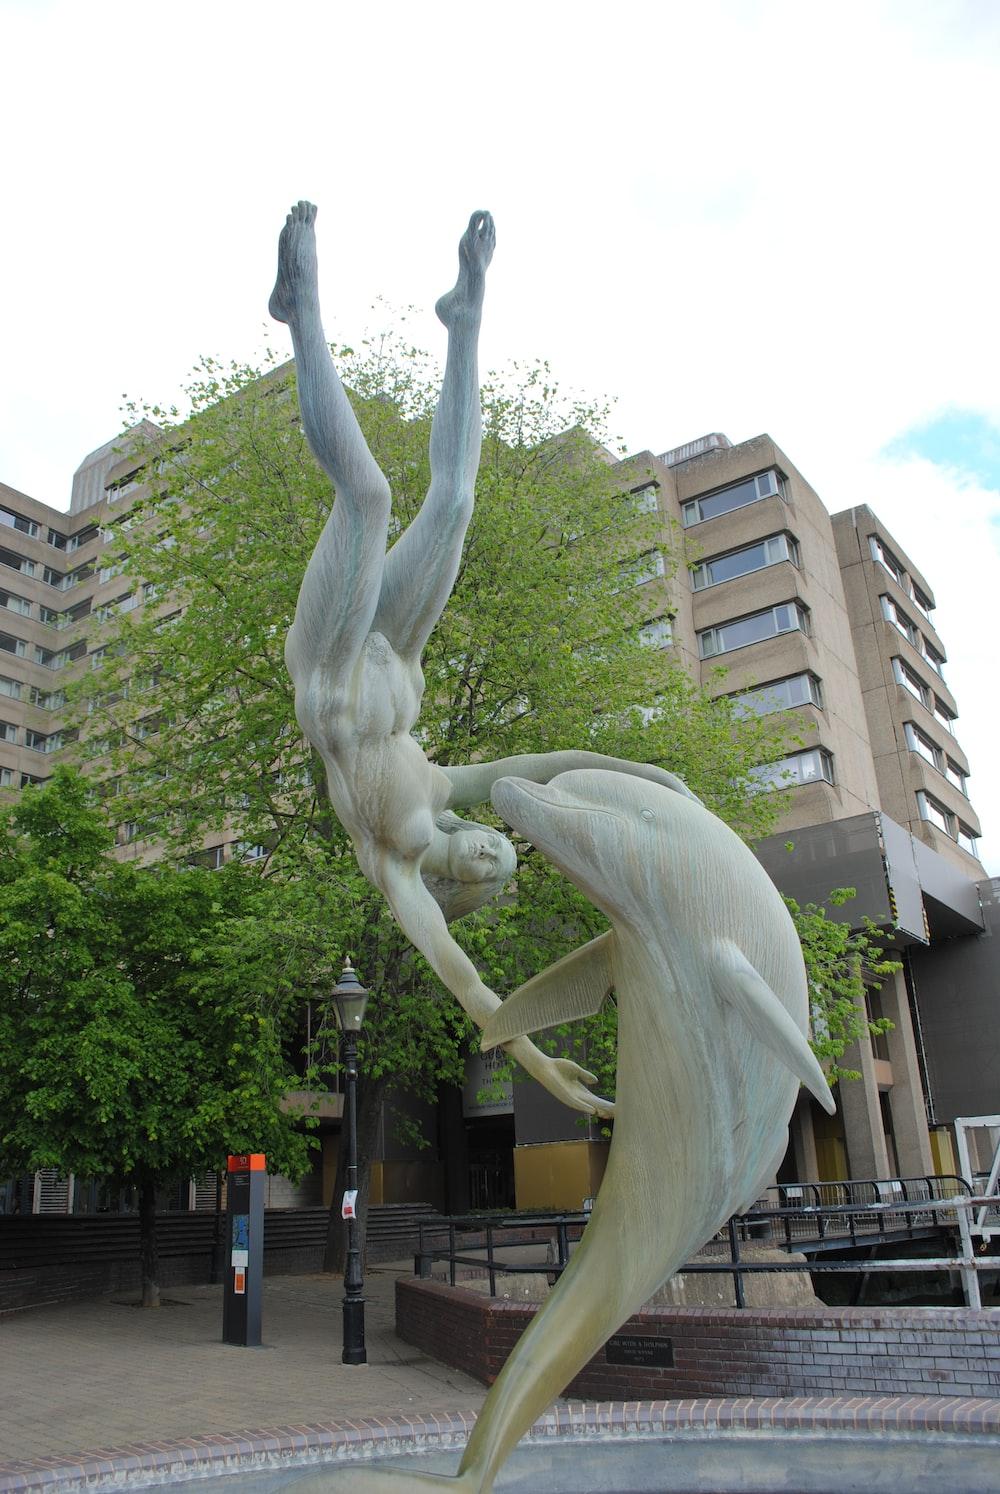 white concrete statue near brown concrete building during daytime